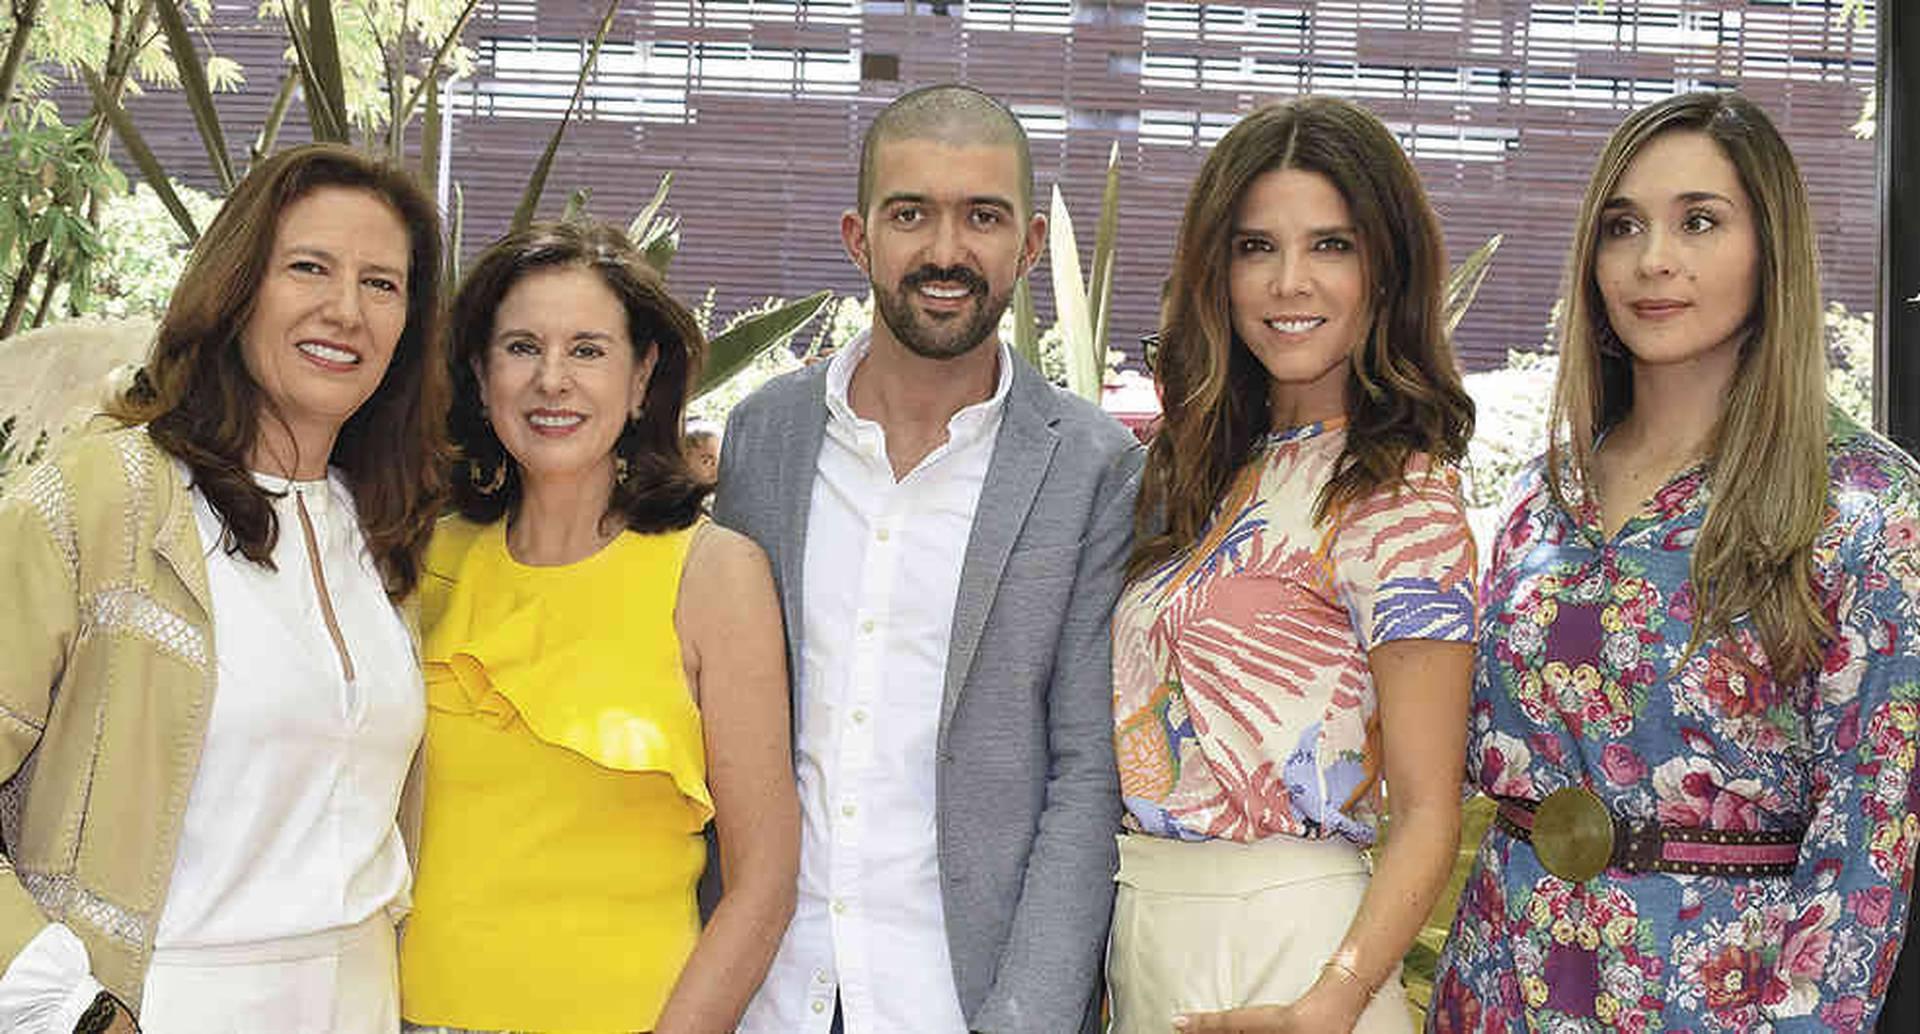 Ana María Fries, Lila Ochoa, Juan Esteban Valencia, Juanita Acosta y Alejandra Álvarez.